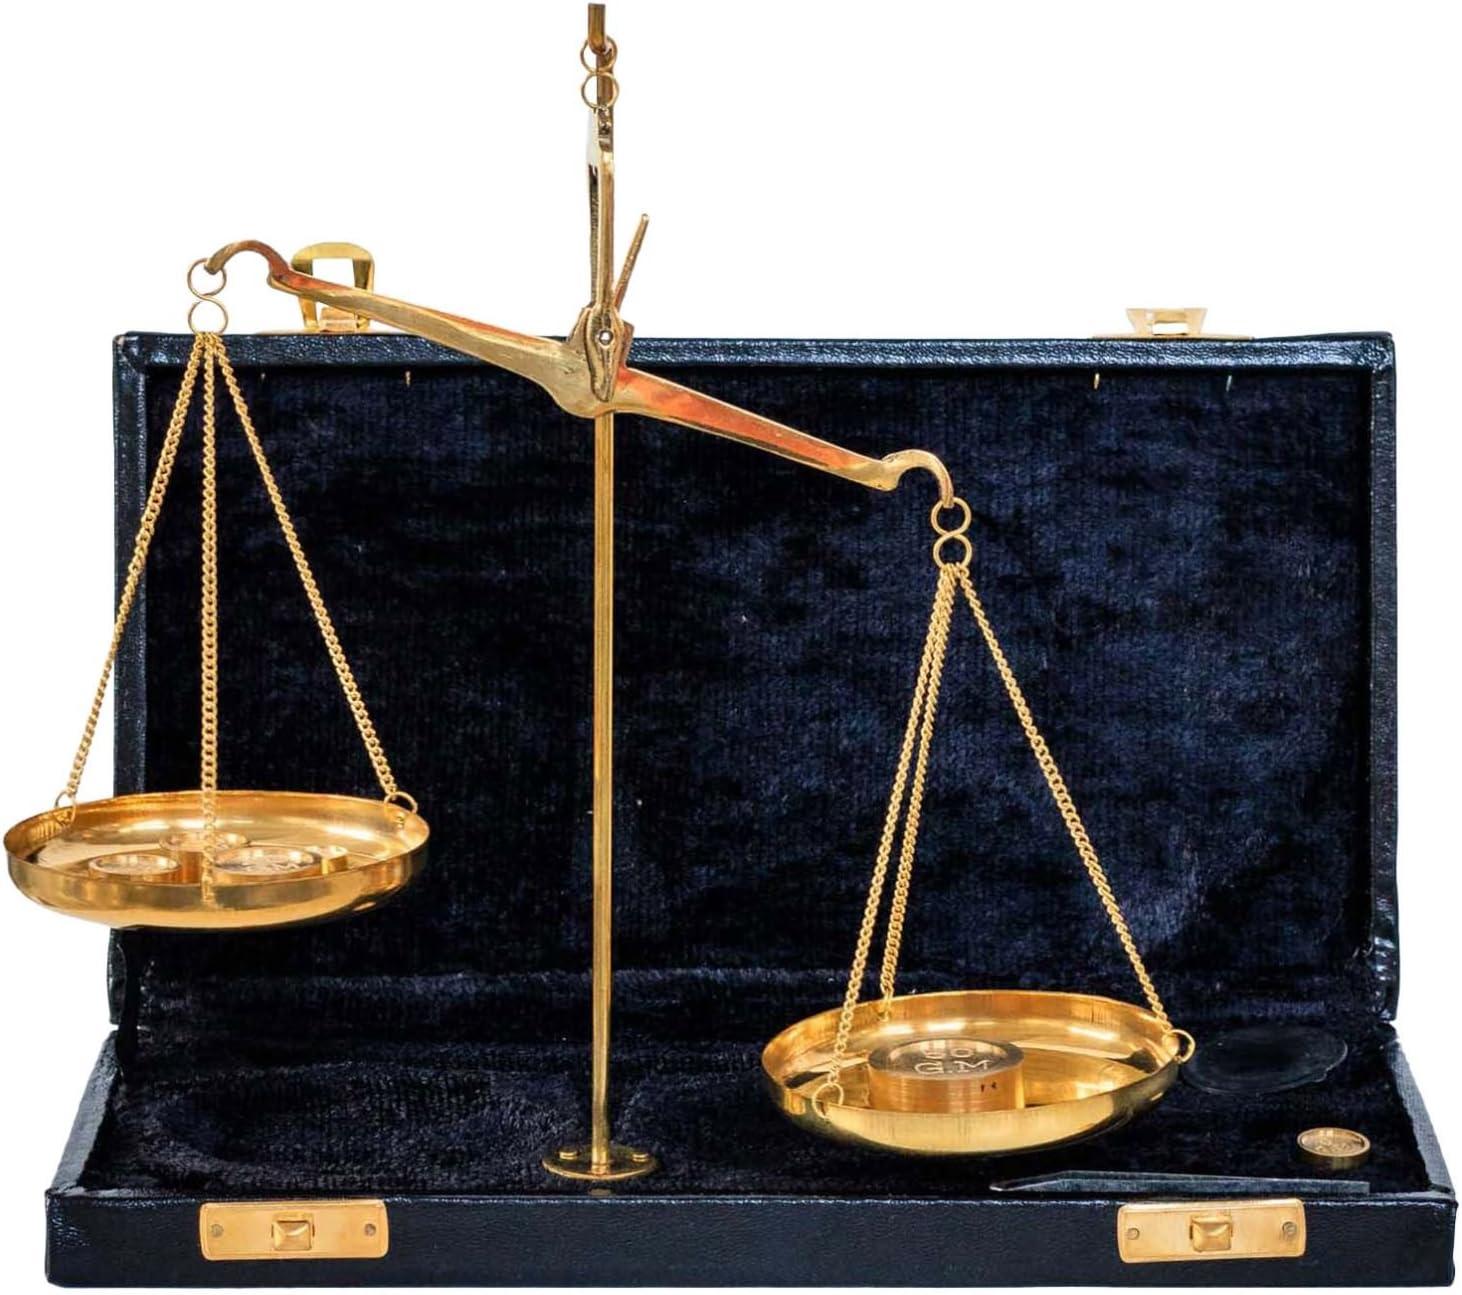 Aubaho Balanza de Farmacia latón balanza para oroestilo Estuche Antiguo 22cm: Amazon.es